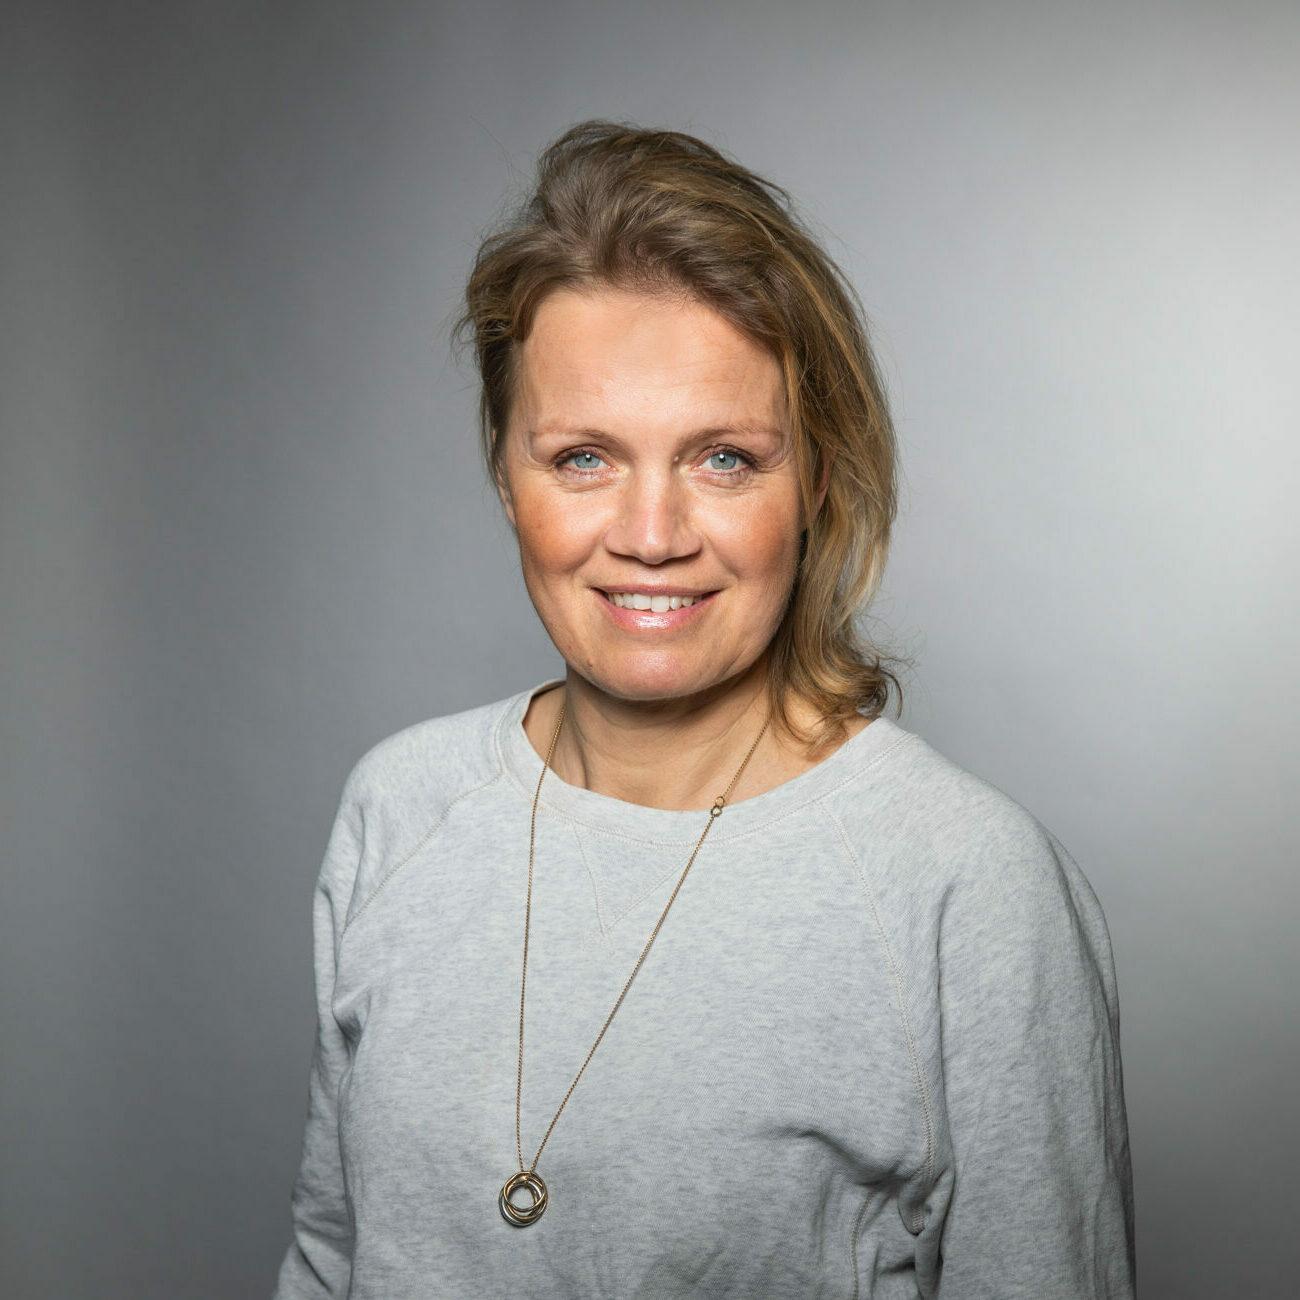 Sara Abramson